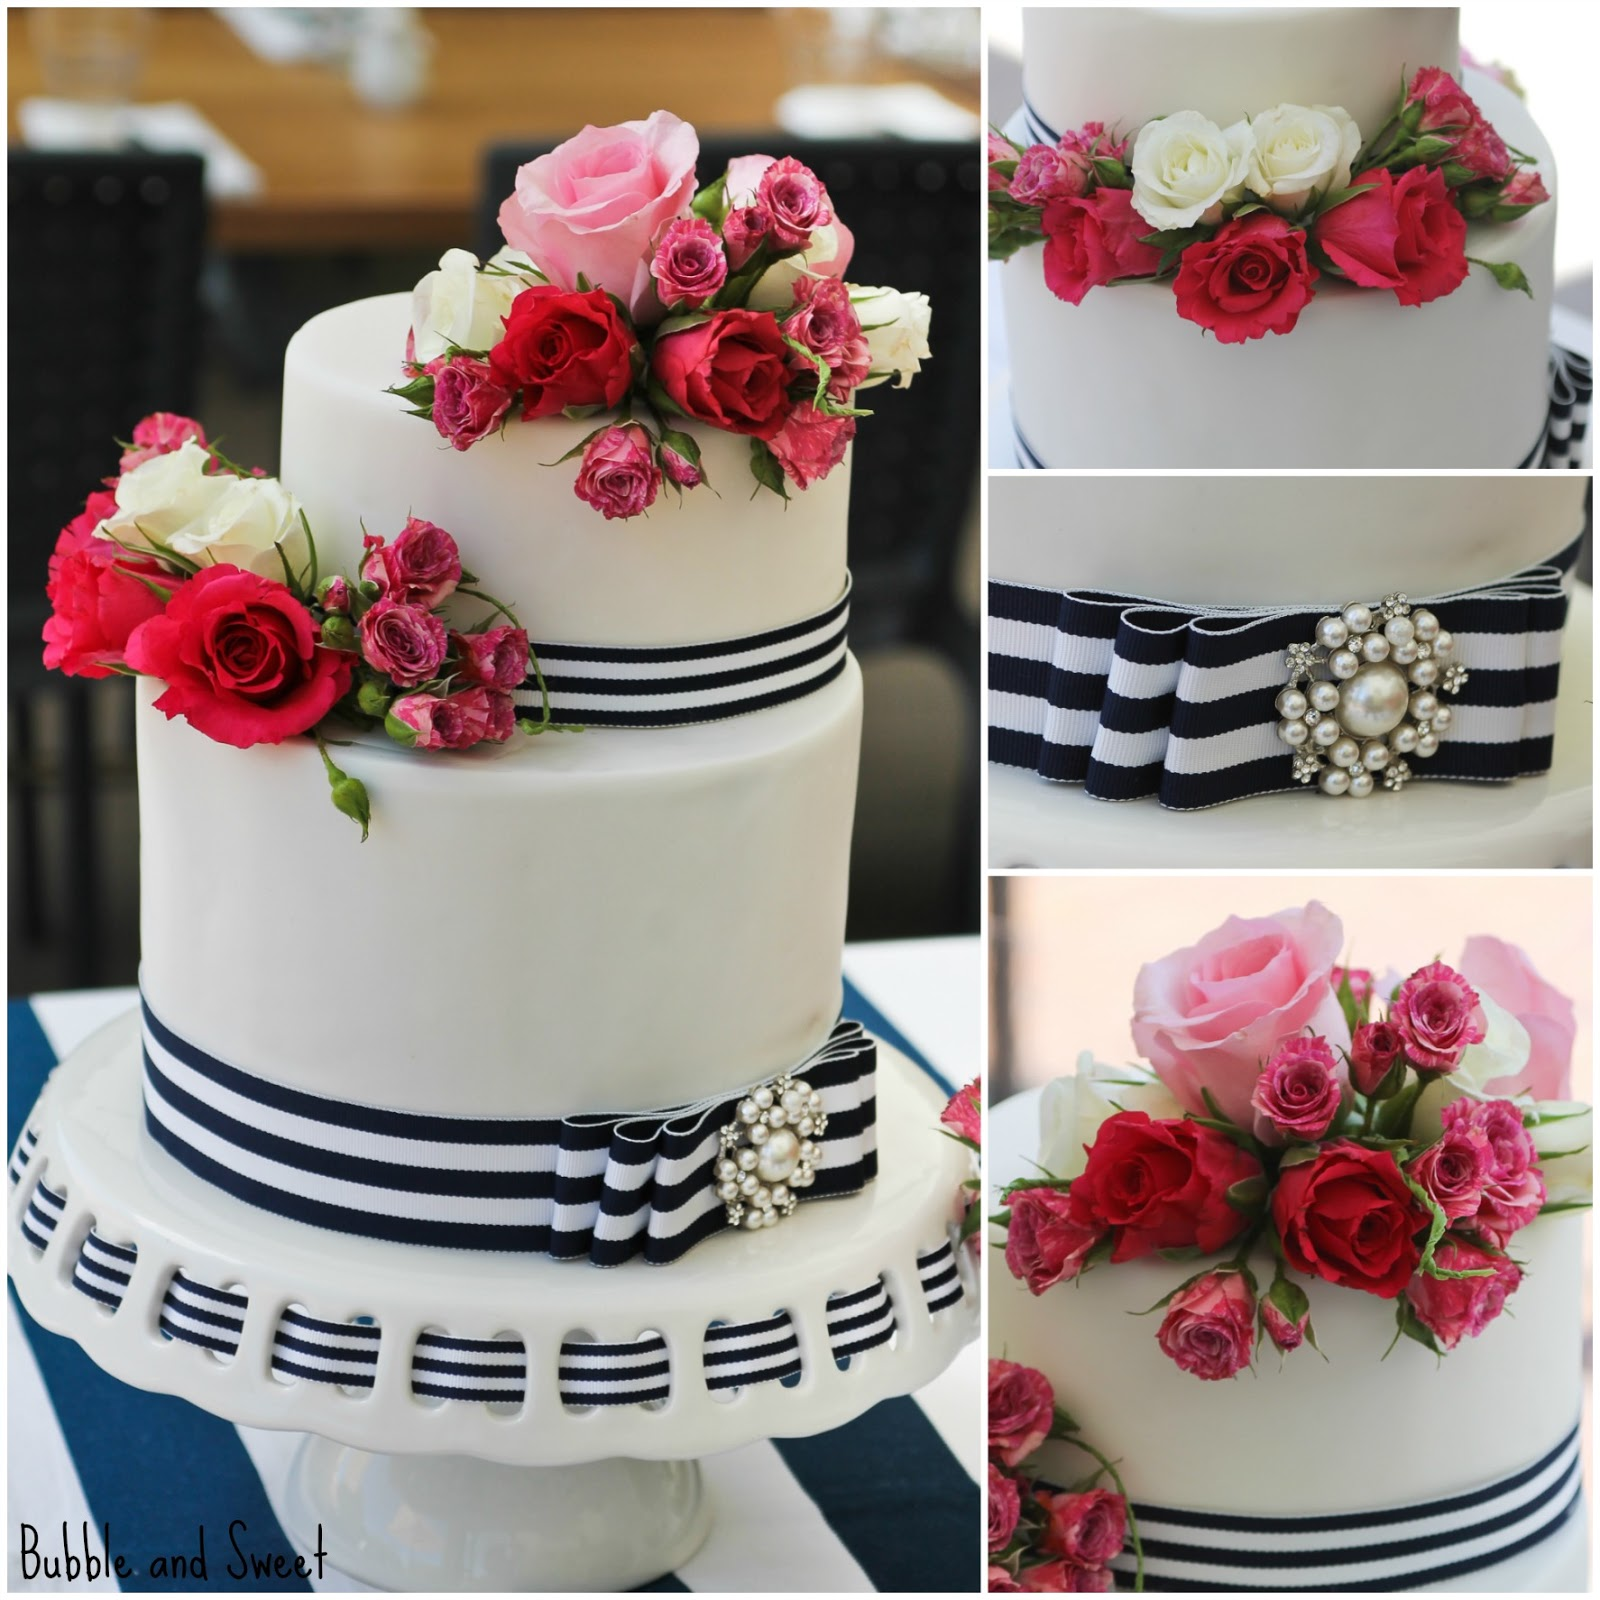 Wedding Ideas Navy and Hot Pink Wedding Theme